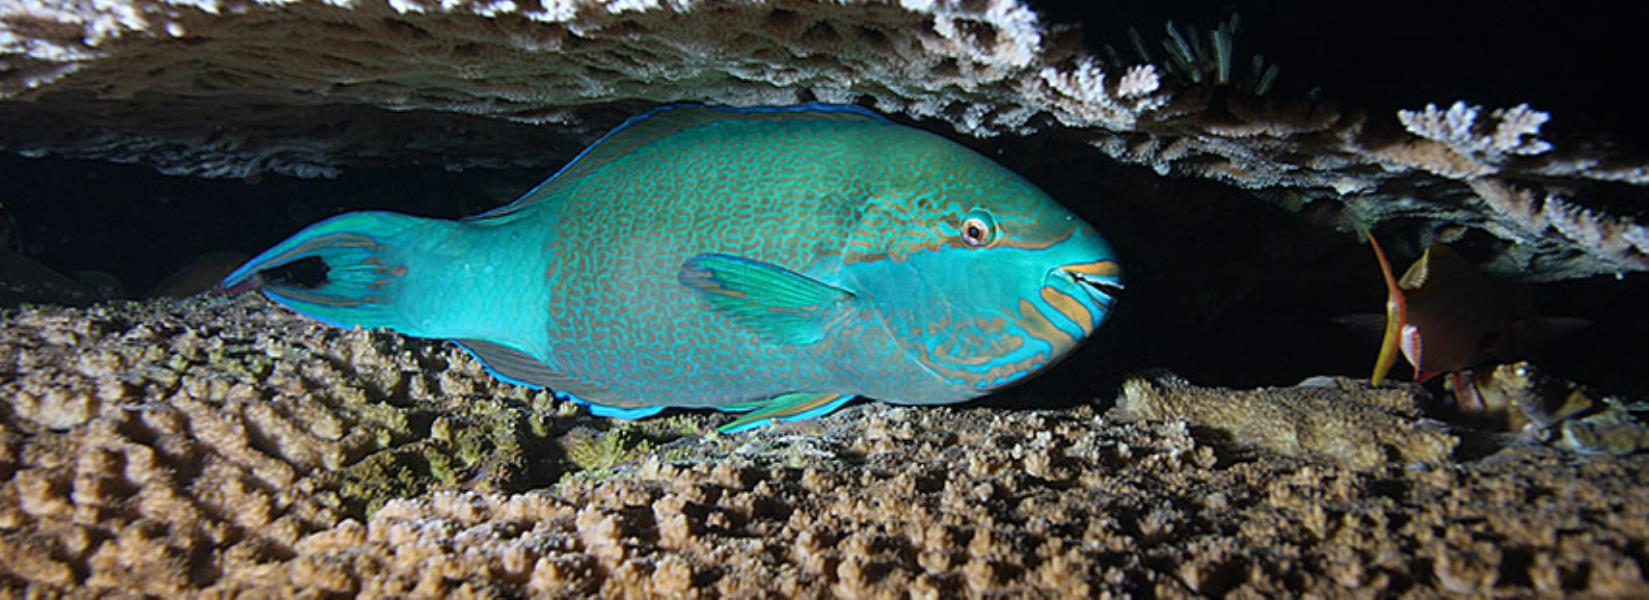 855fishinfo-parrotfish